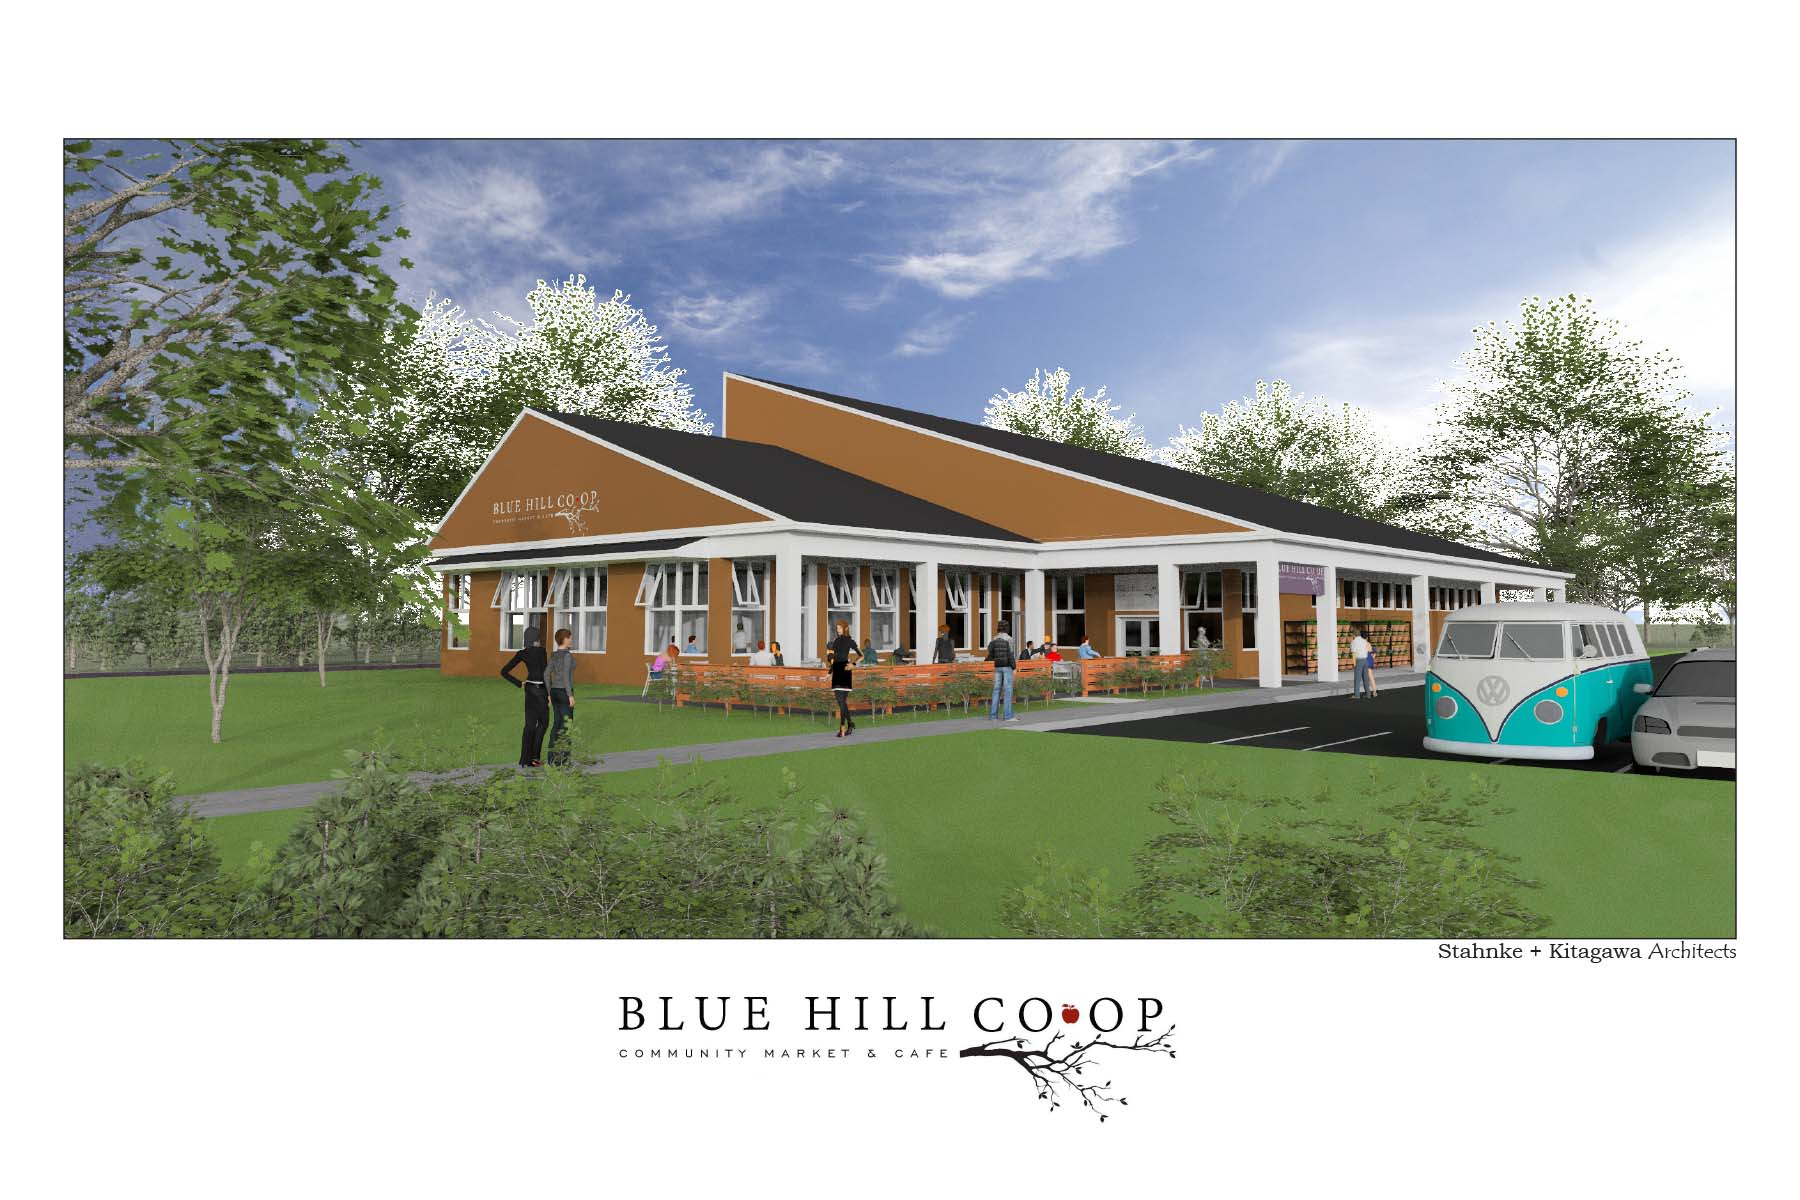 Blue Hill Coop